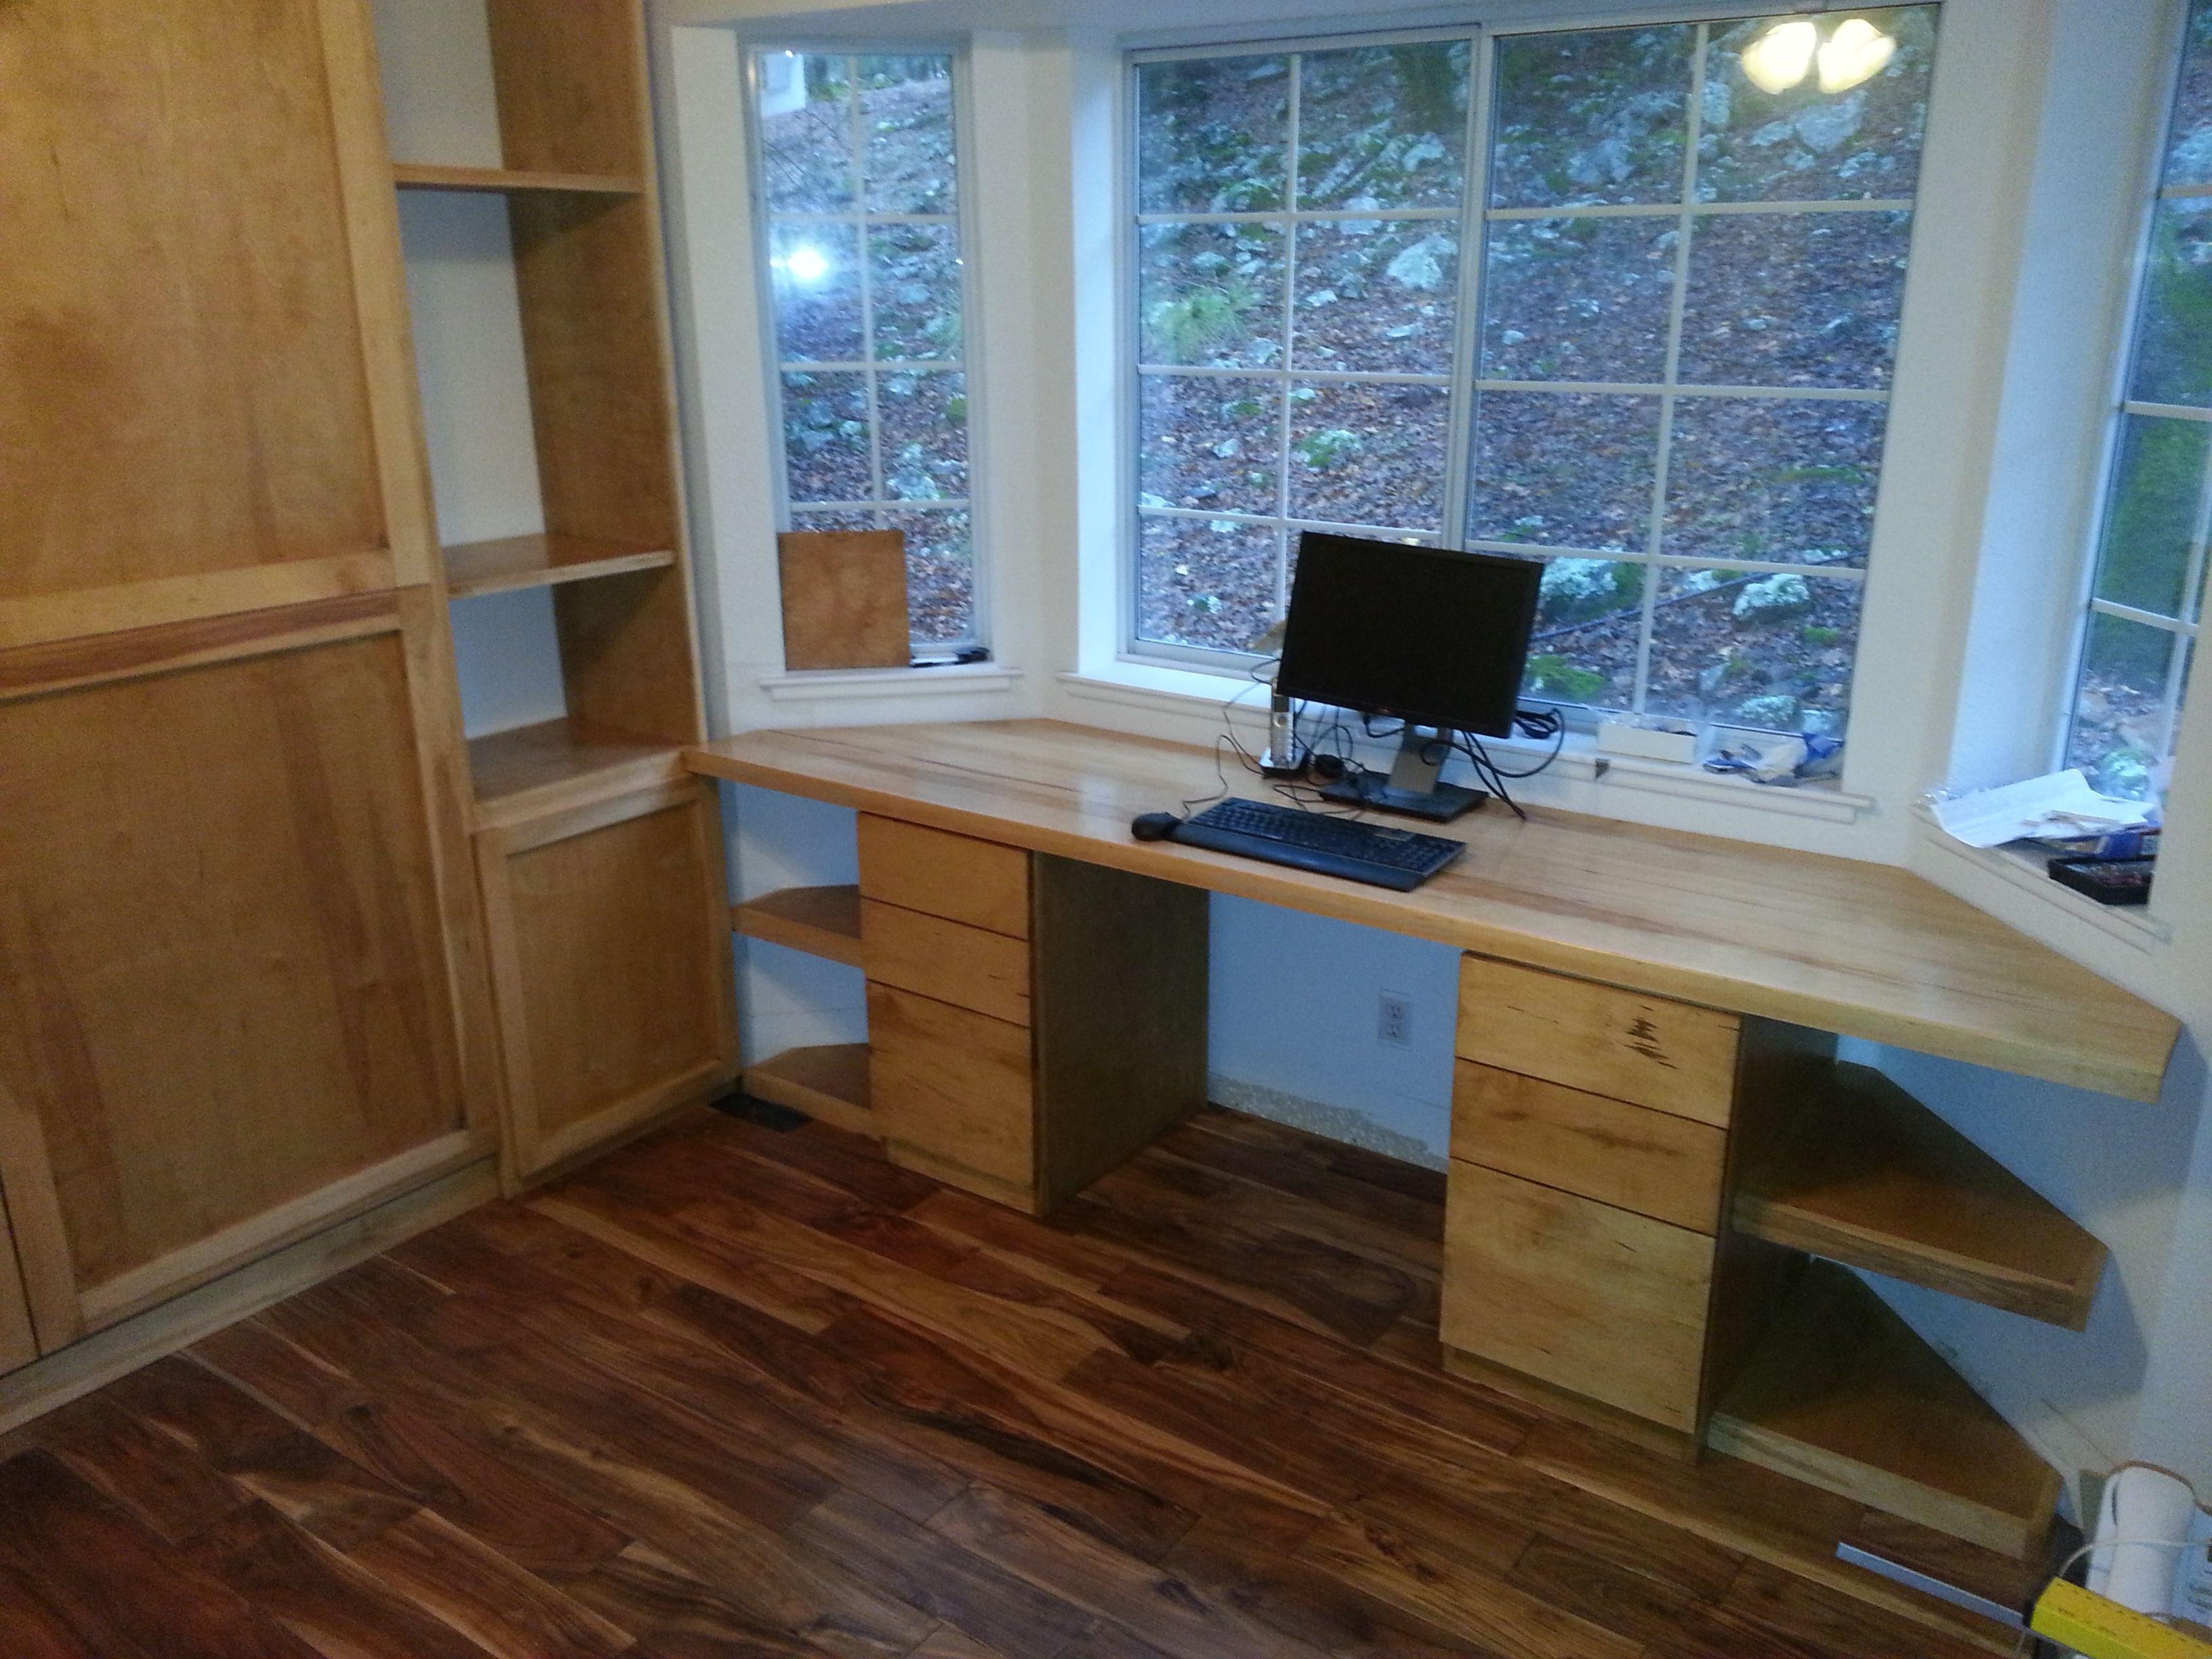 The Pine Shop Murphy Bed Photos Live Window Desk